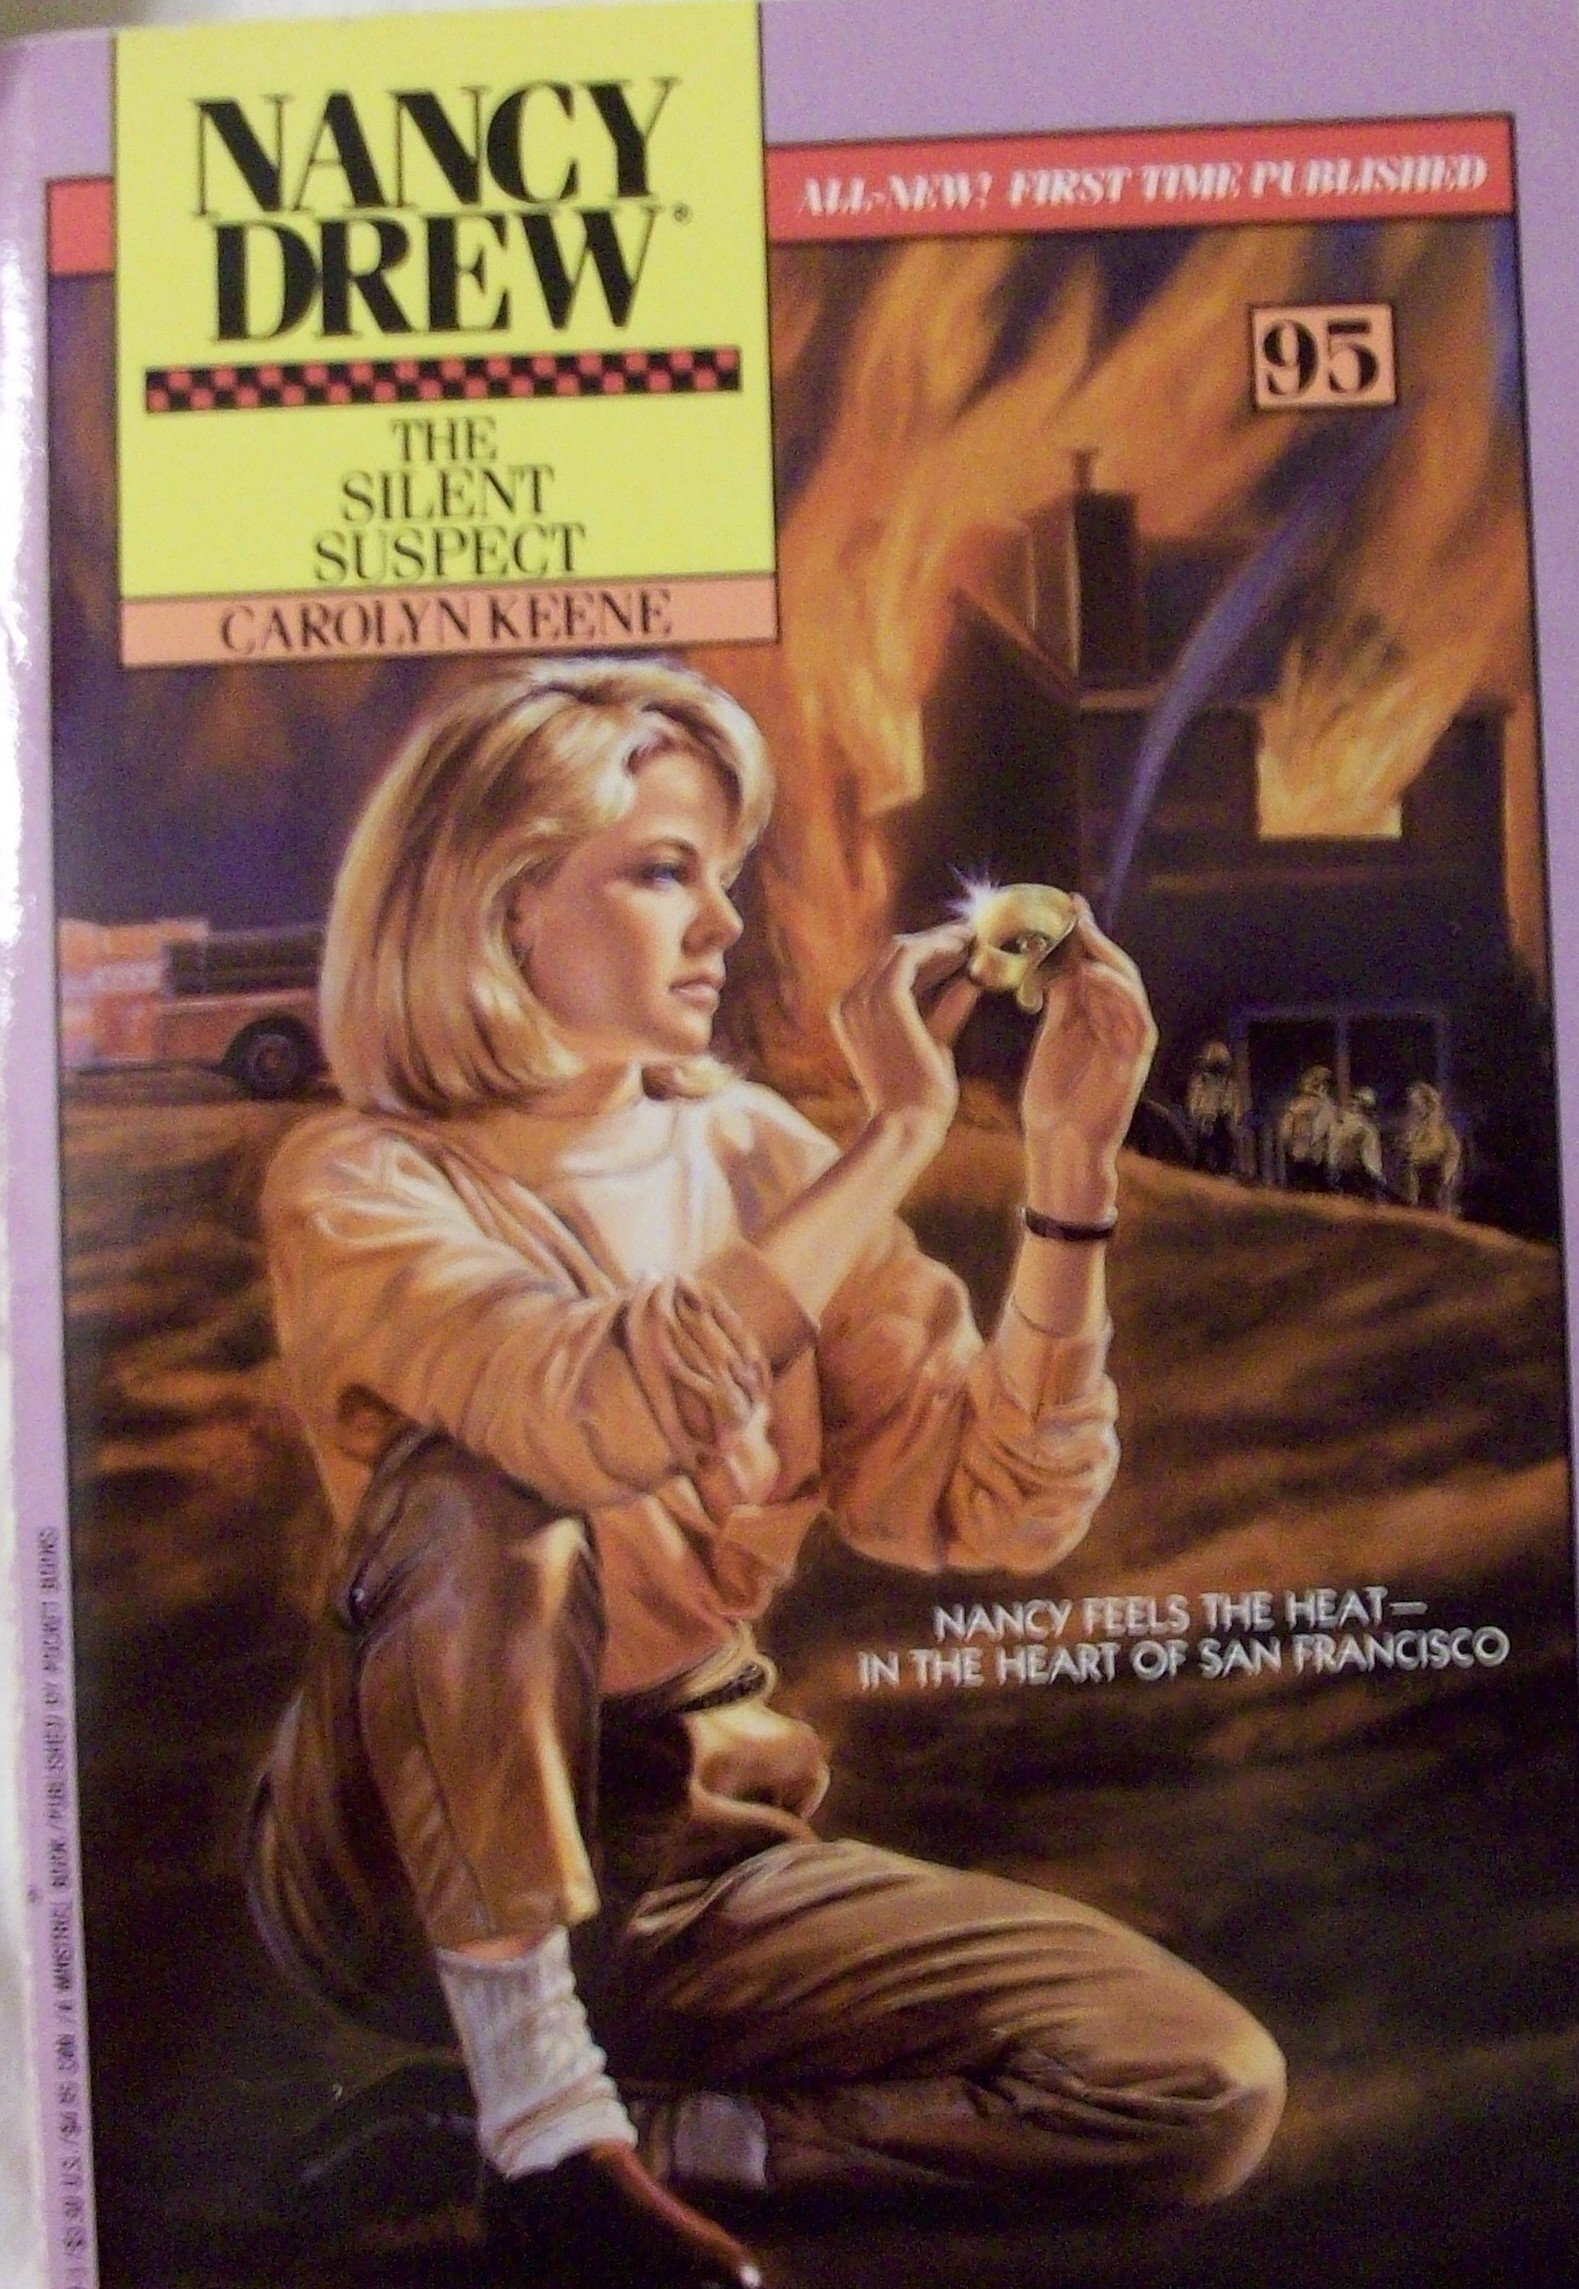 The Silent Suspect (Nancy Drew #95)